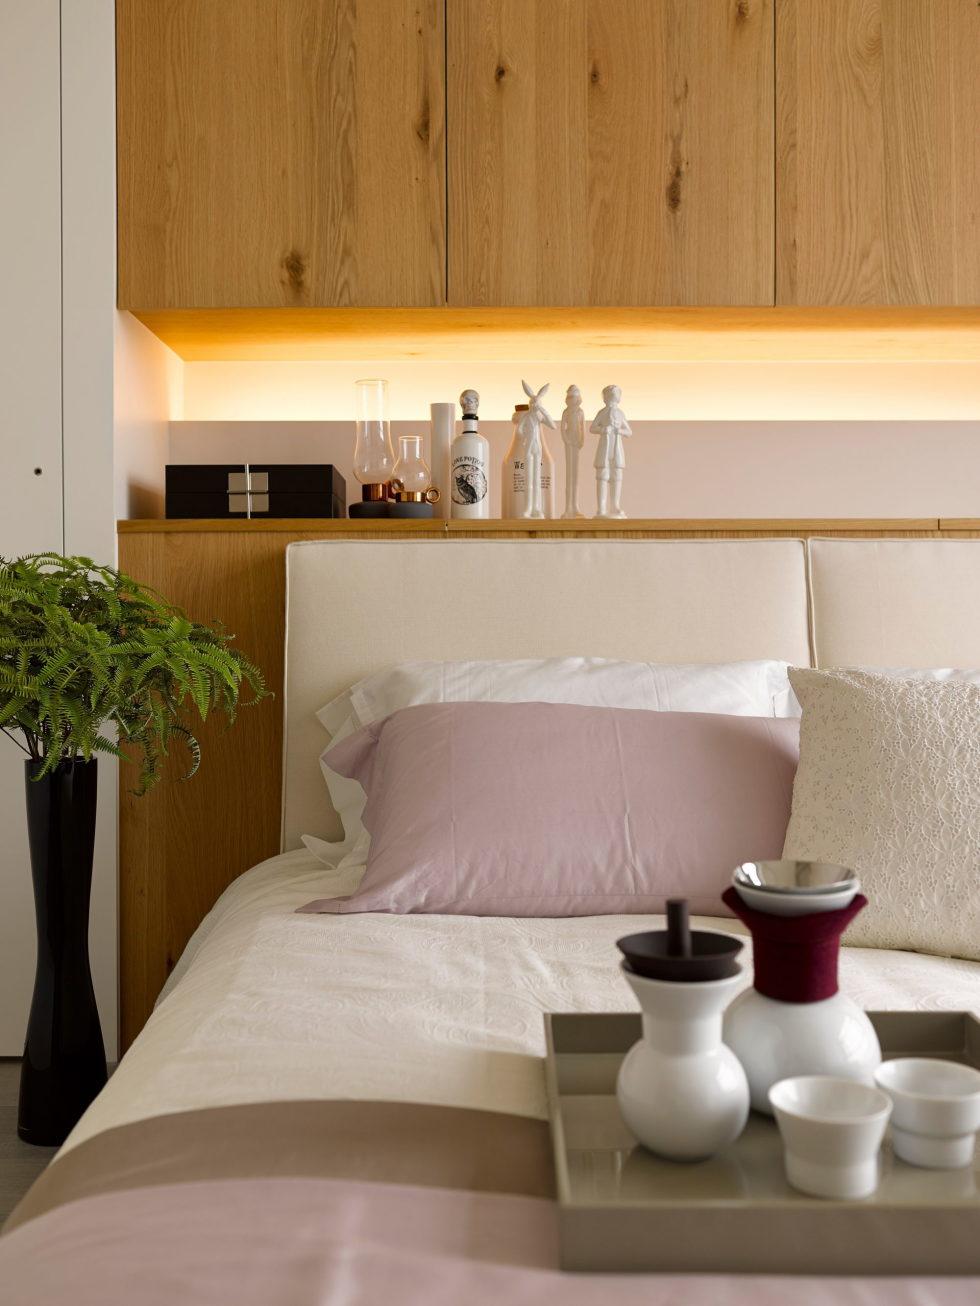 Modern Three-Room Apartment From Ganna Design Studio In Taipei, Taiwan 16